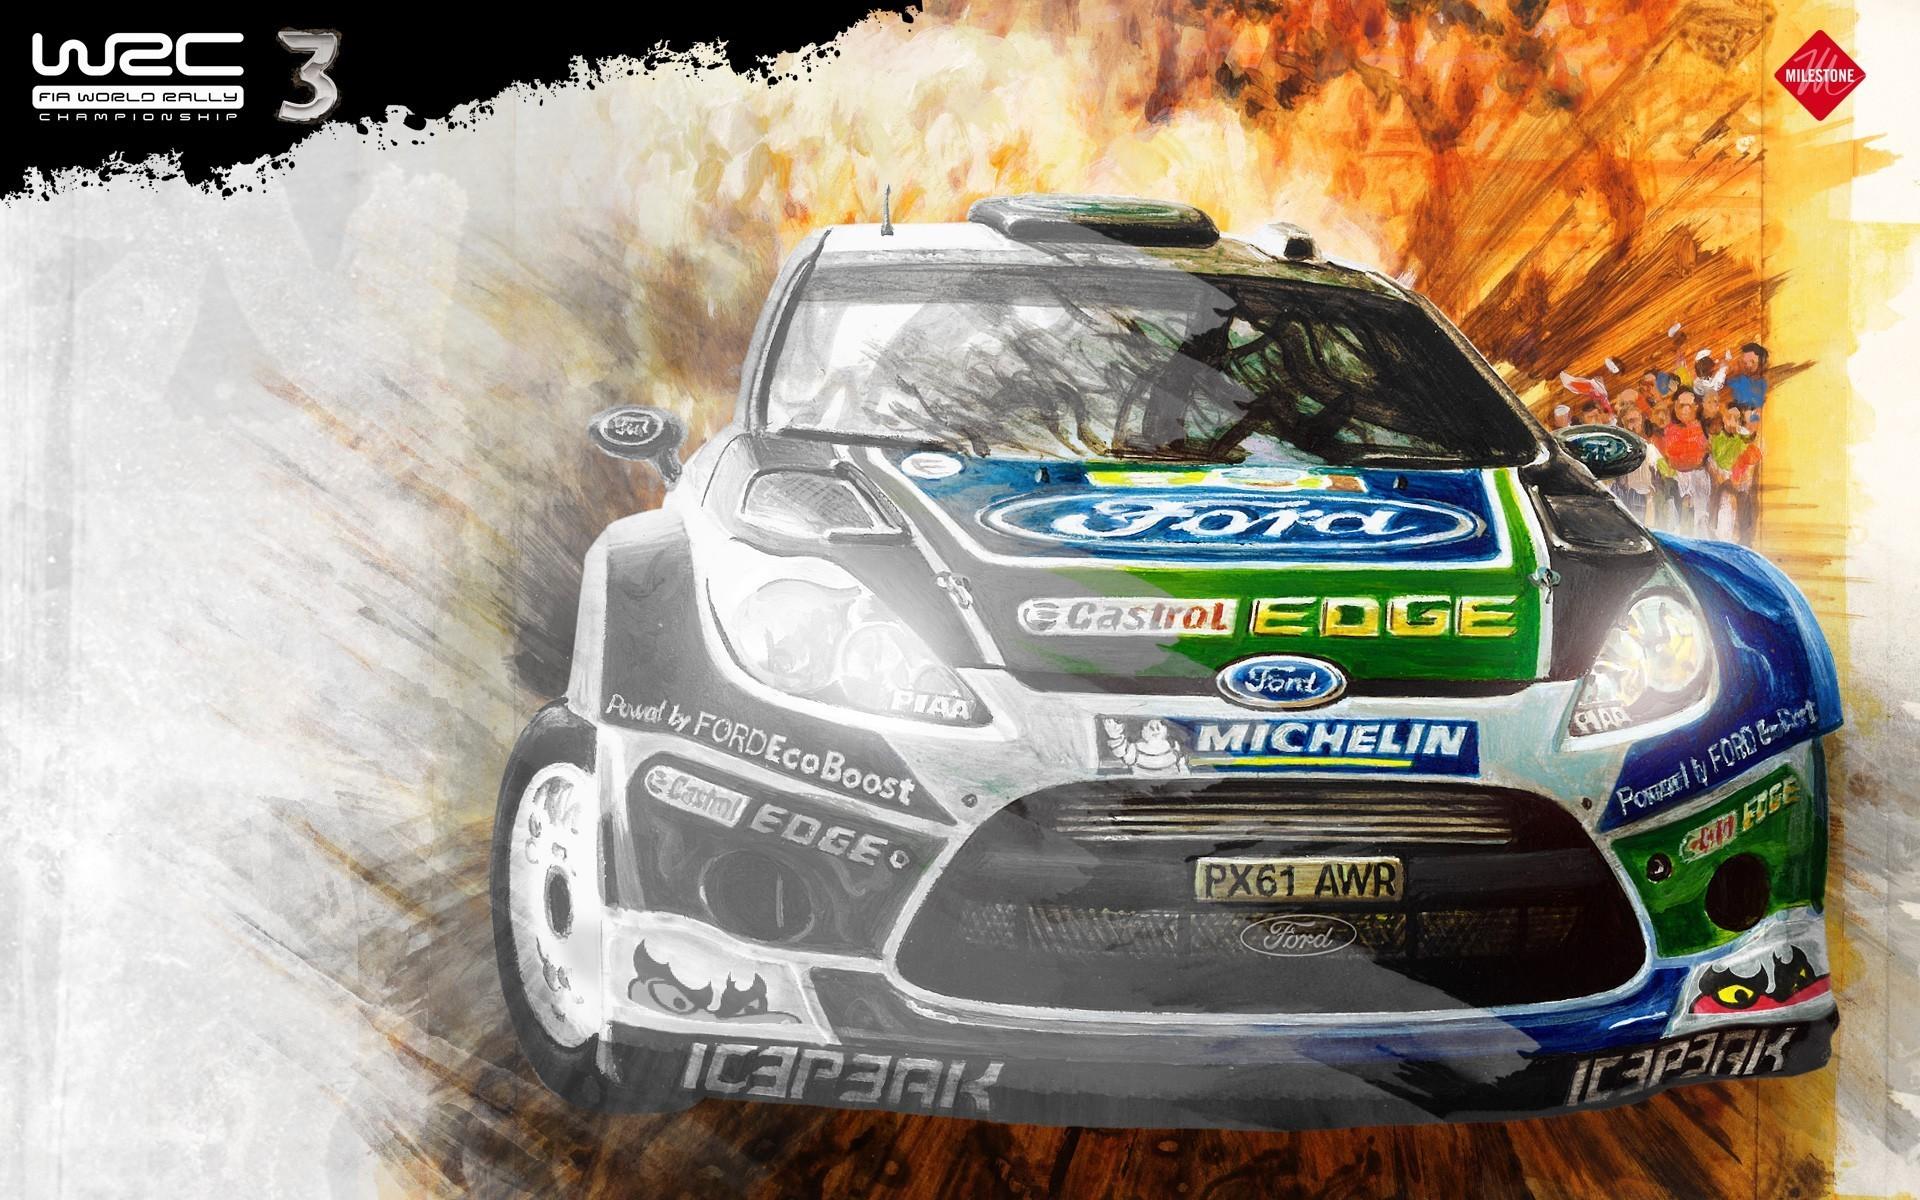 Res: 1920x1200, Vehicles racing wrc world championship fiesta car wallpaper